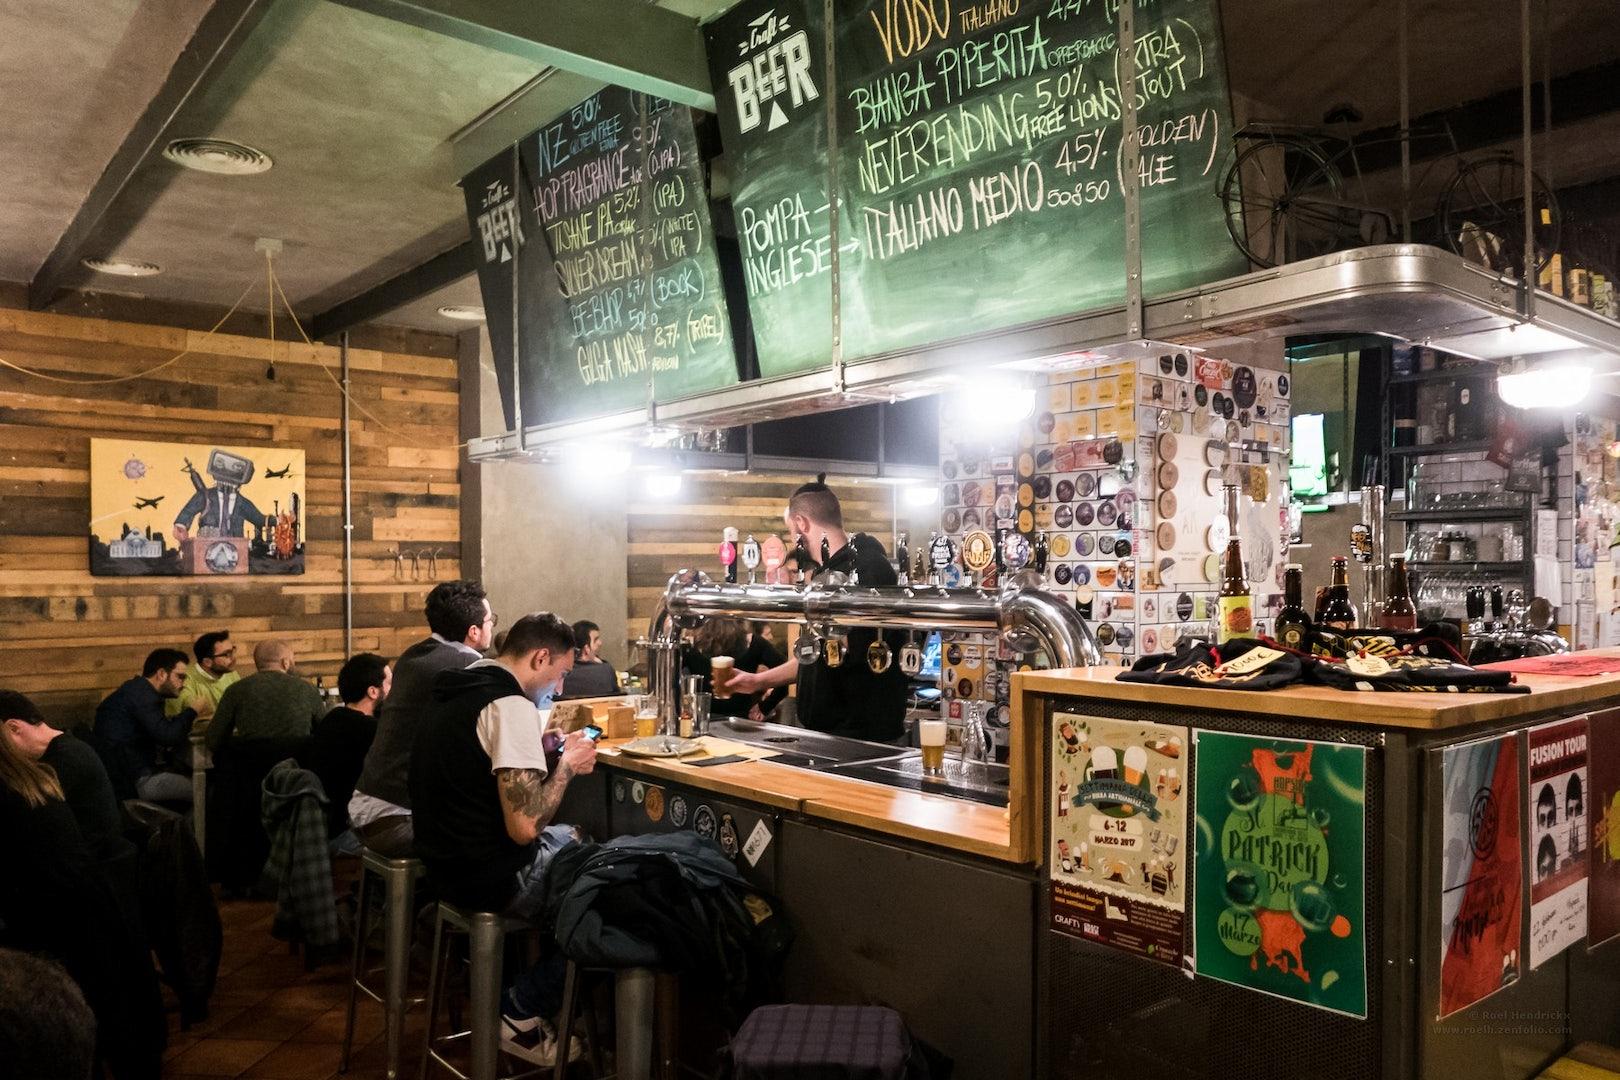 Bar interior of Hopside